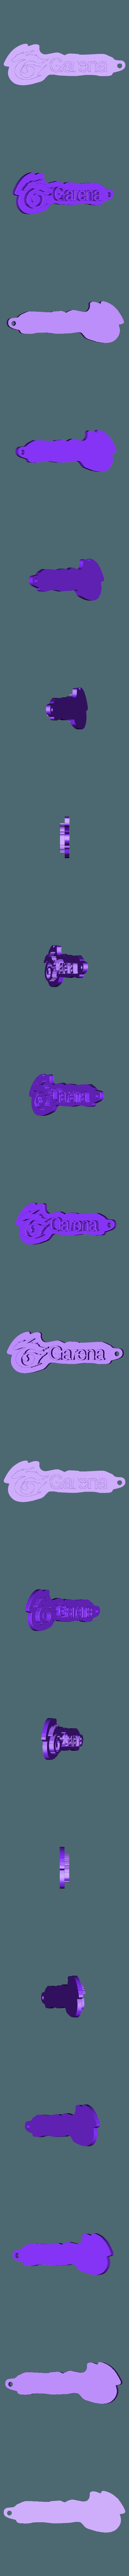 LLAVERO GARENA.obj Download free 3DS file Garena logo free fire gaming new • 3D print model, ronaldocc13